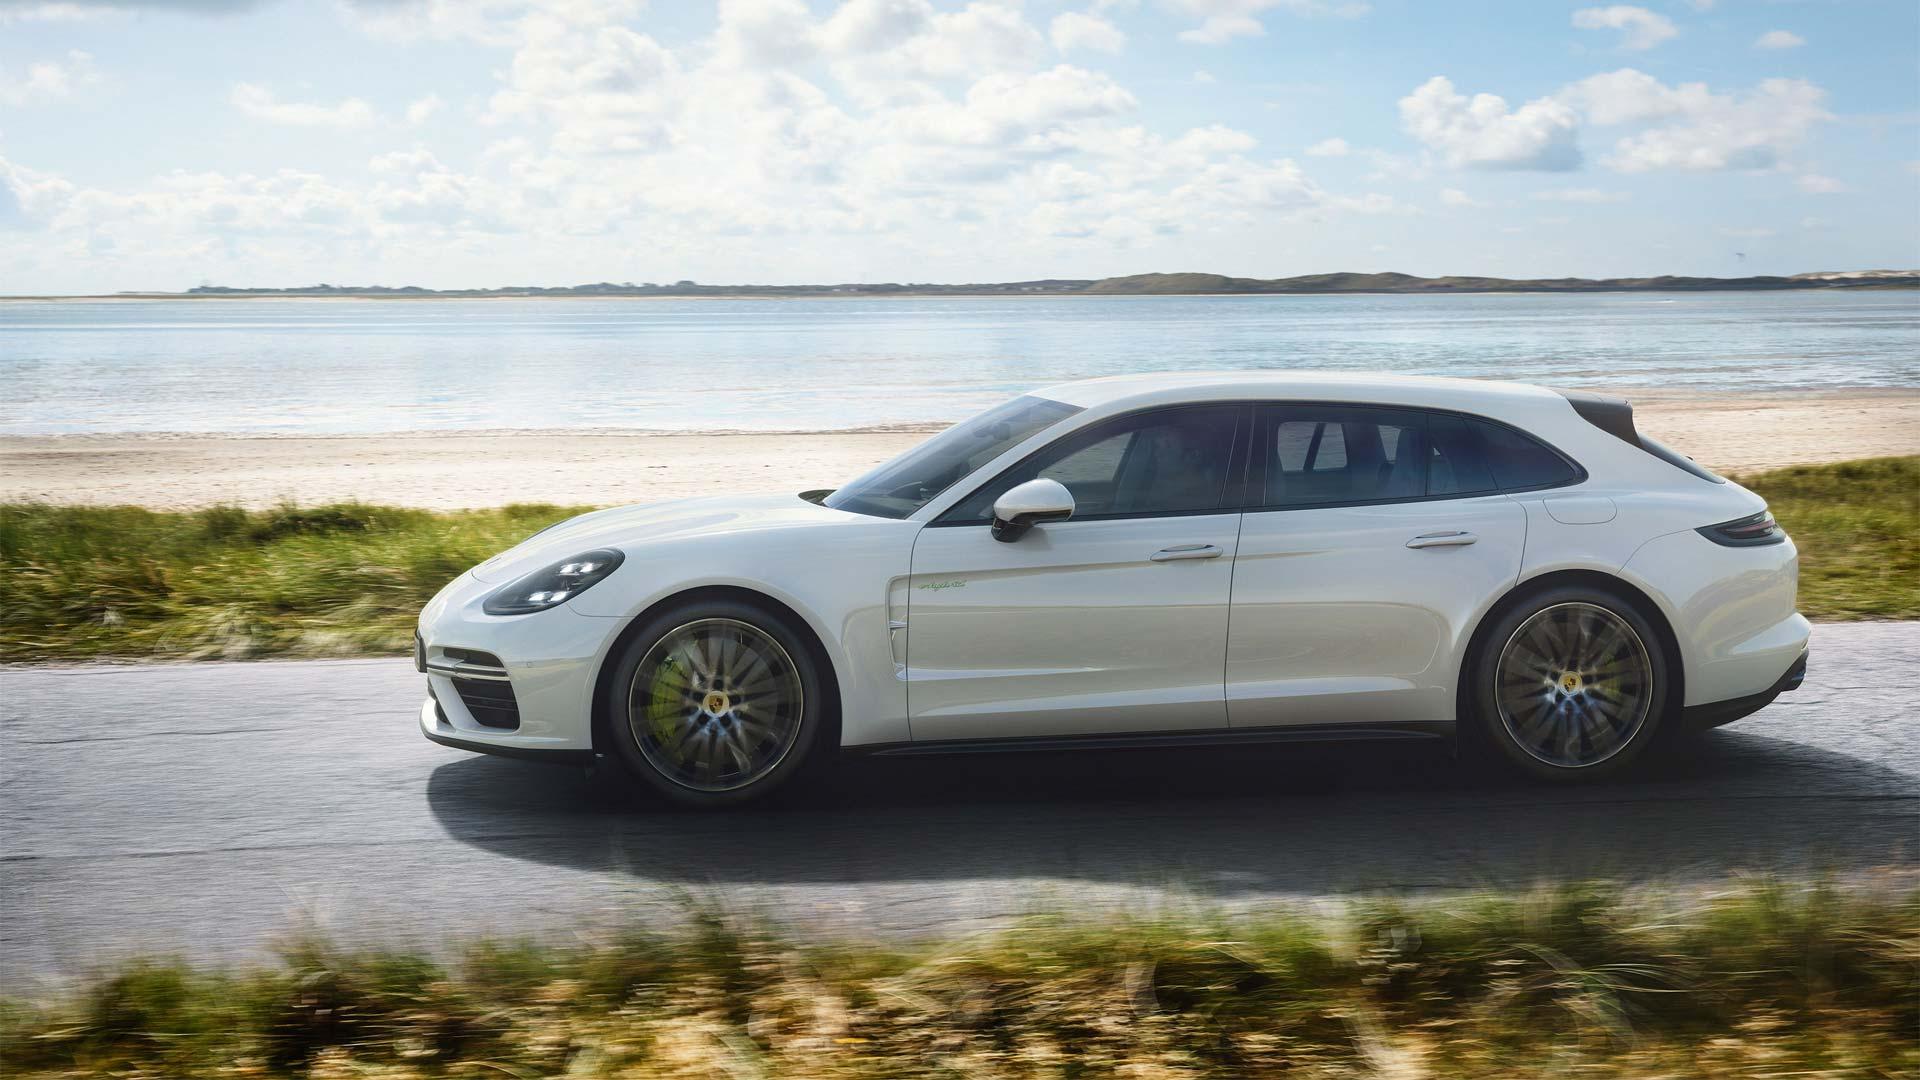 Porsche-Panamera-Turbo-S-E-Hybrid-Sport-Turismo_3